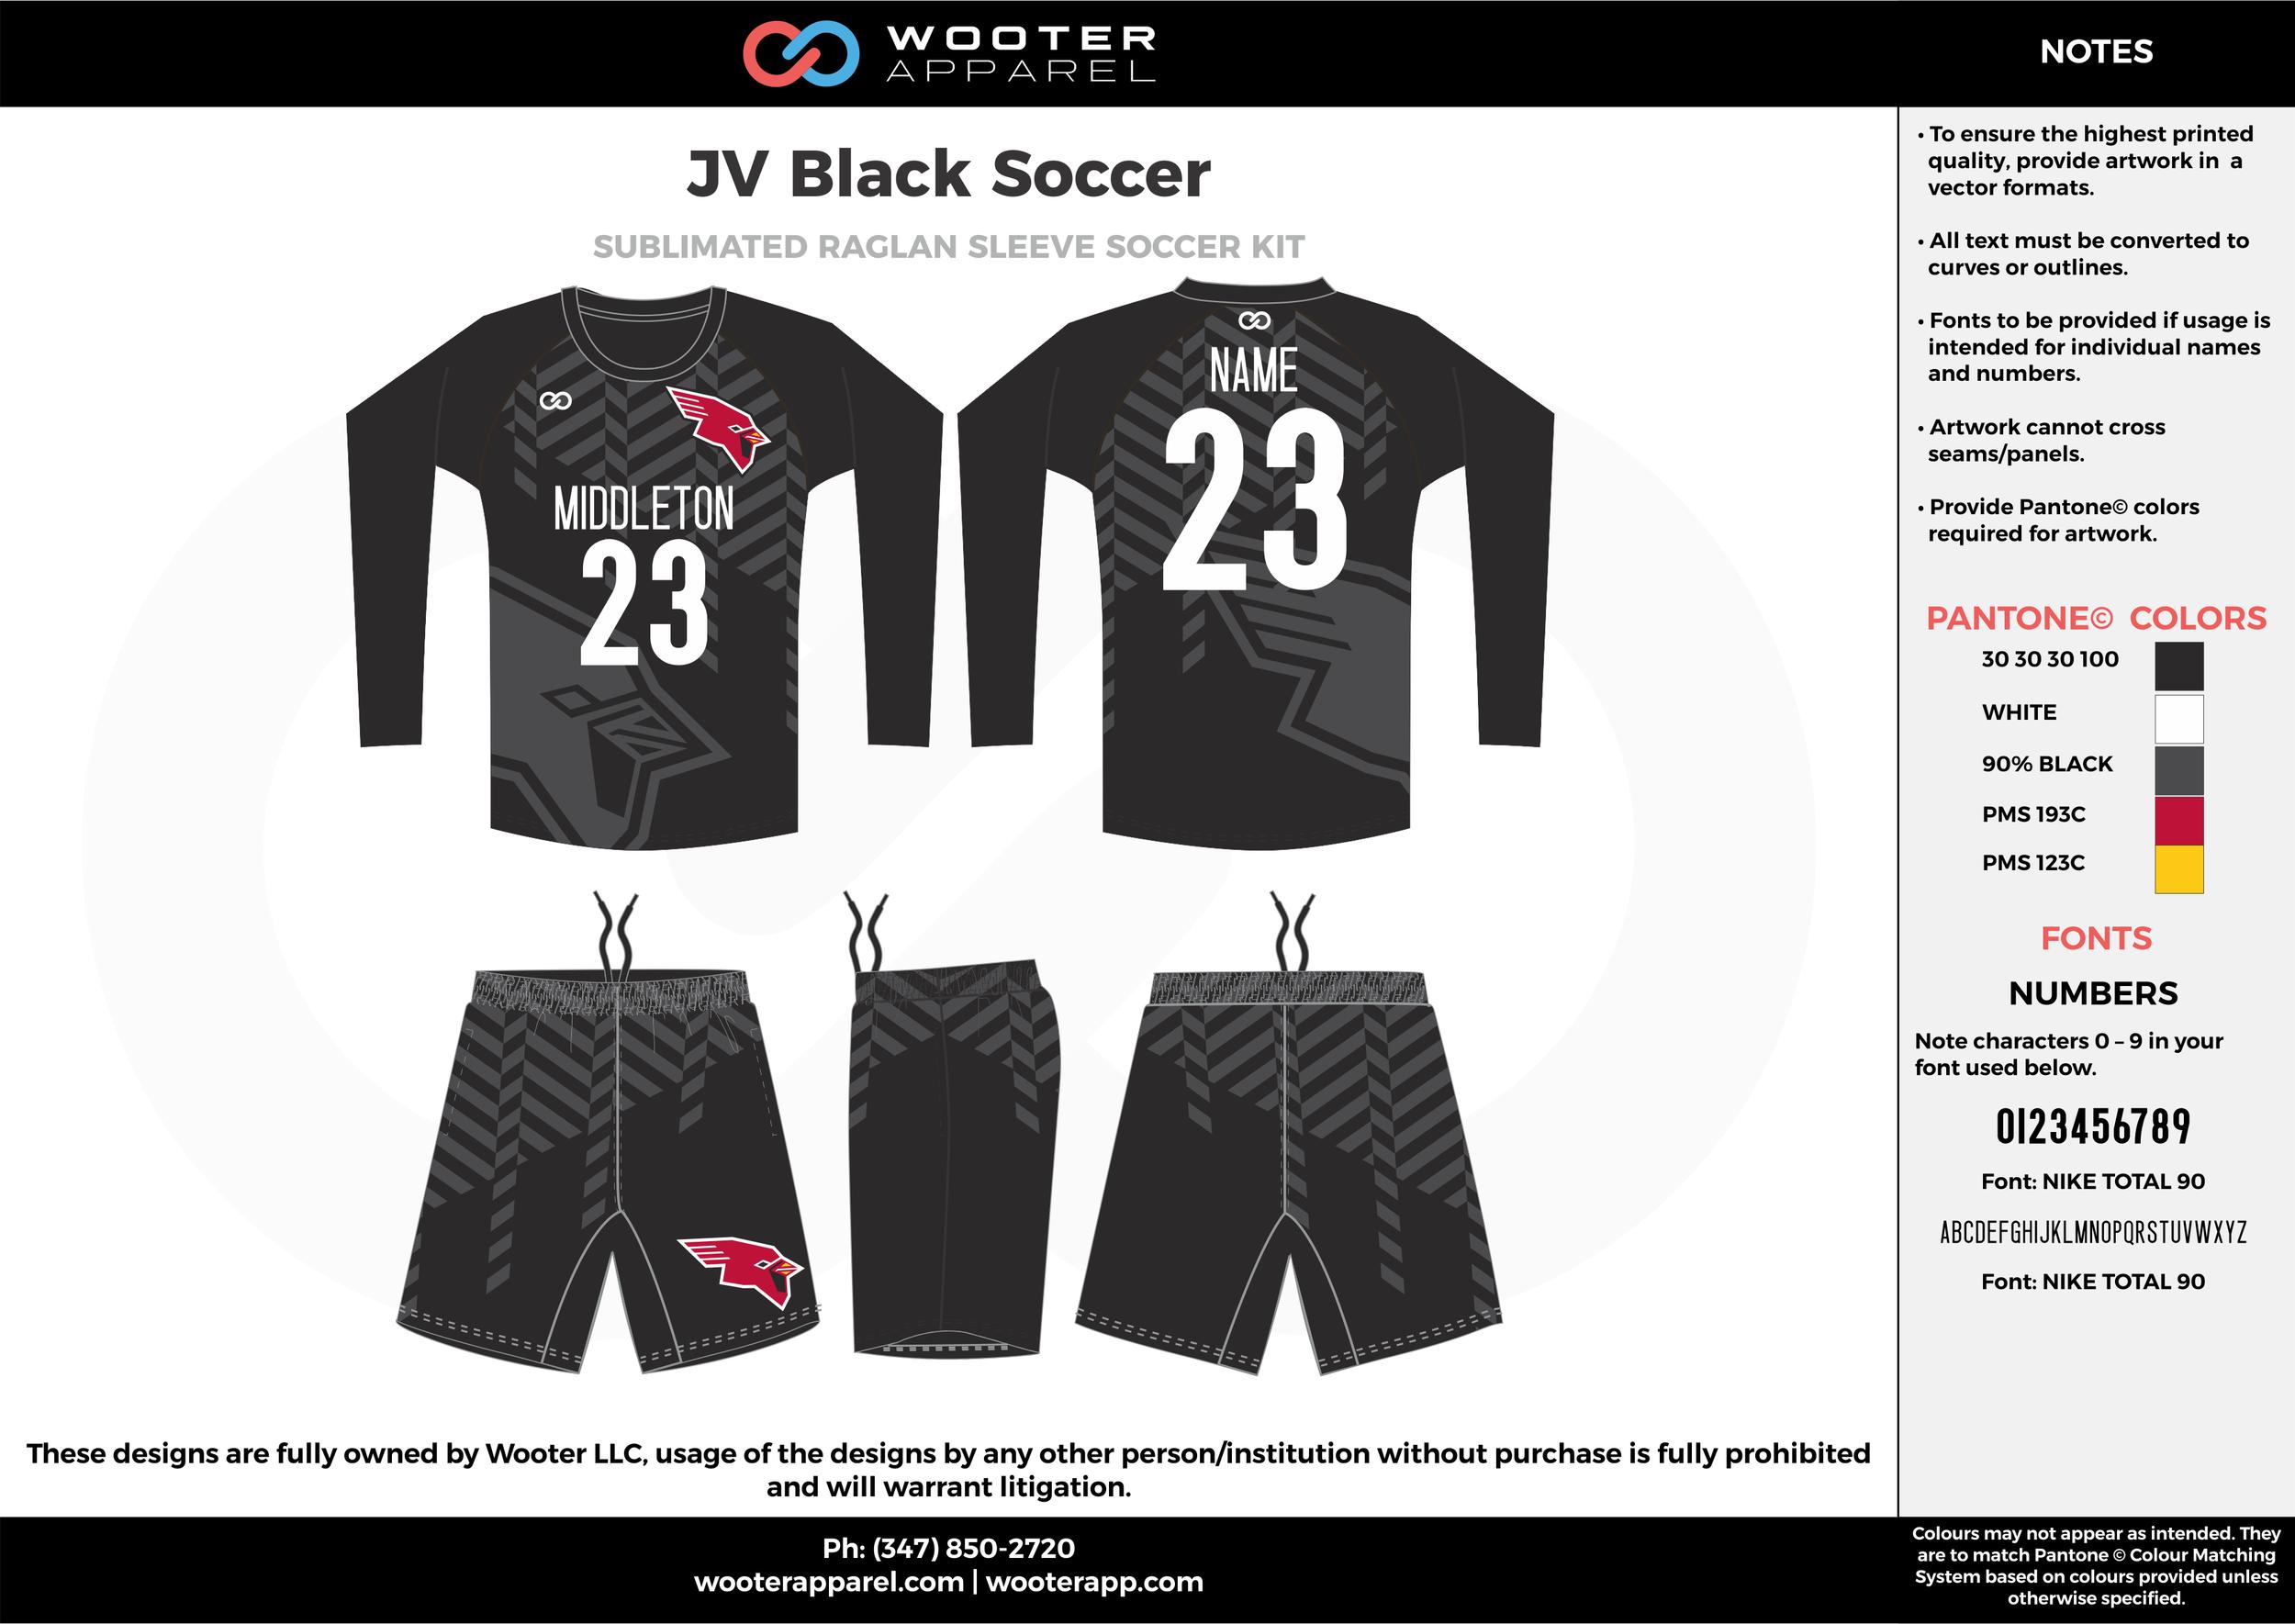 JV Black black gray white custom sublimated soccer uniform jersey sweatshirt shorts